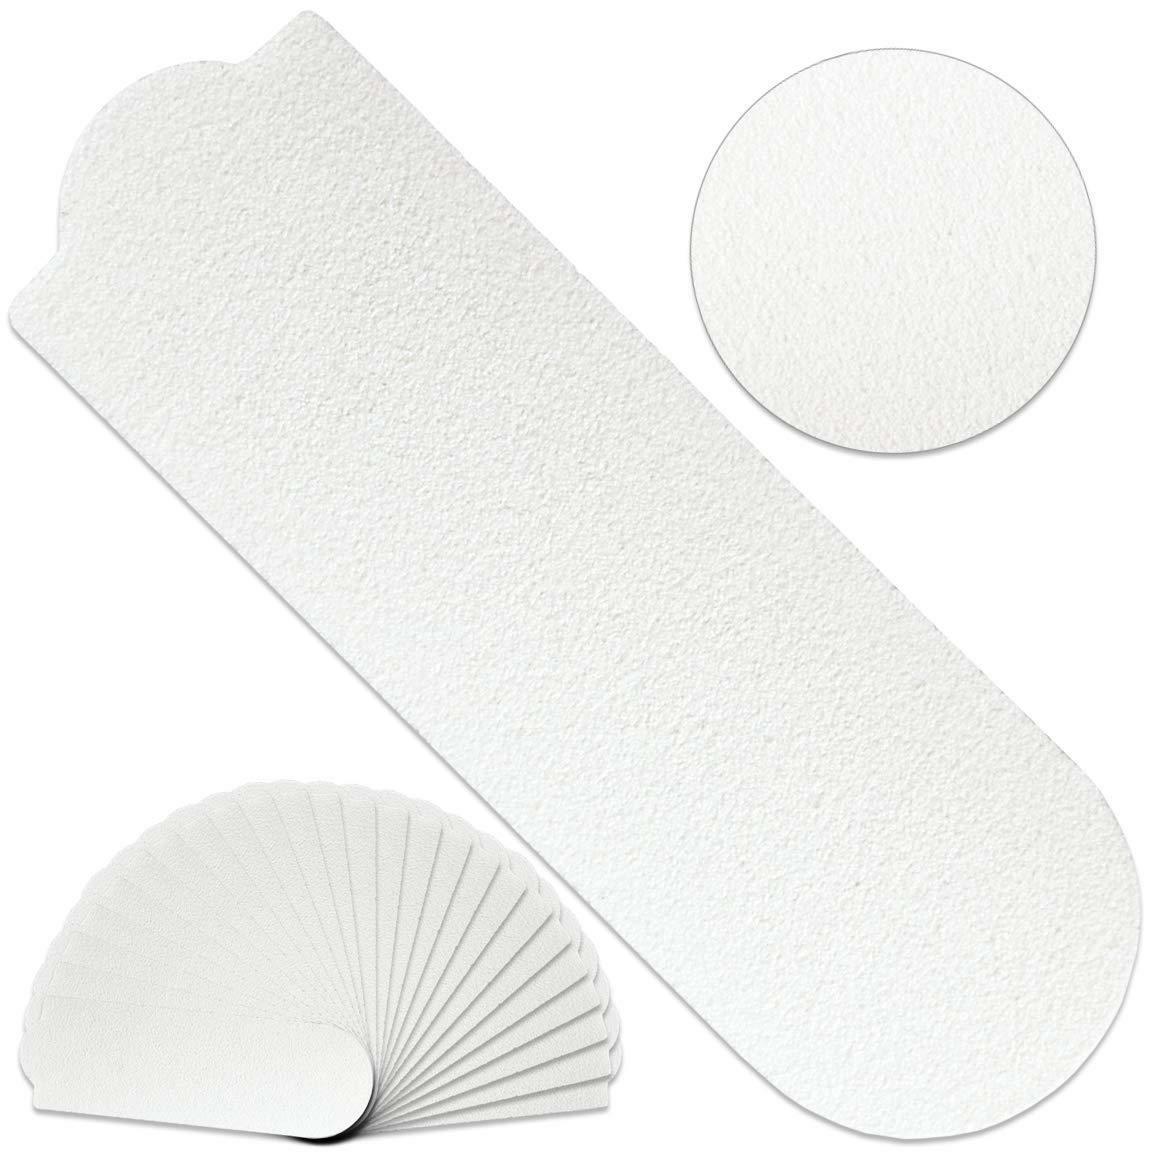 25pcs stainless steel pedi nail file refill